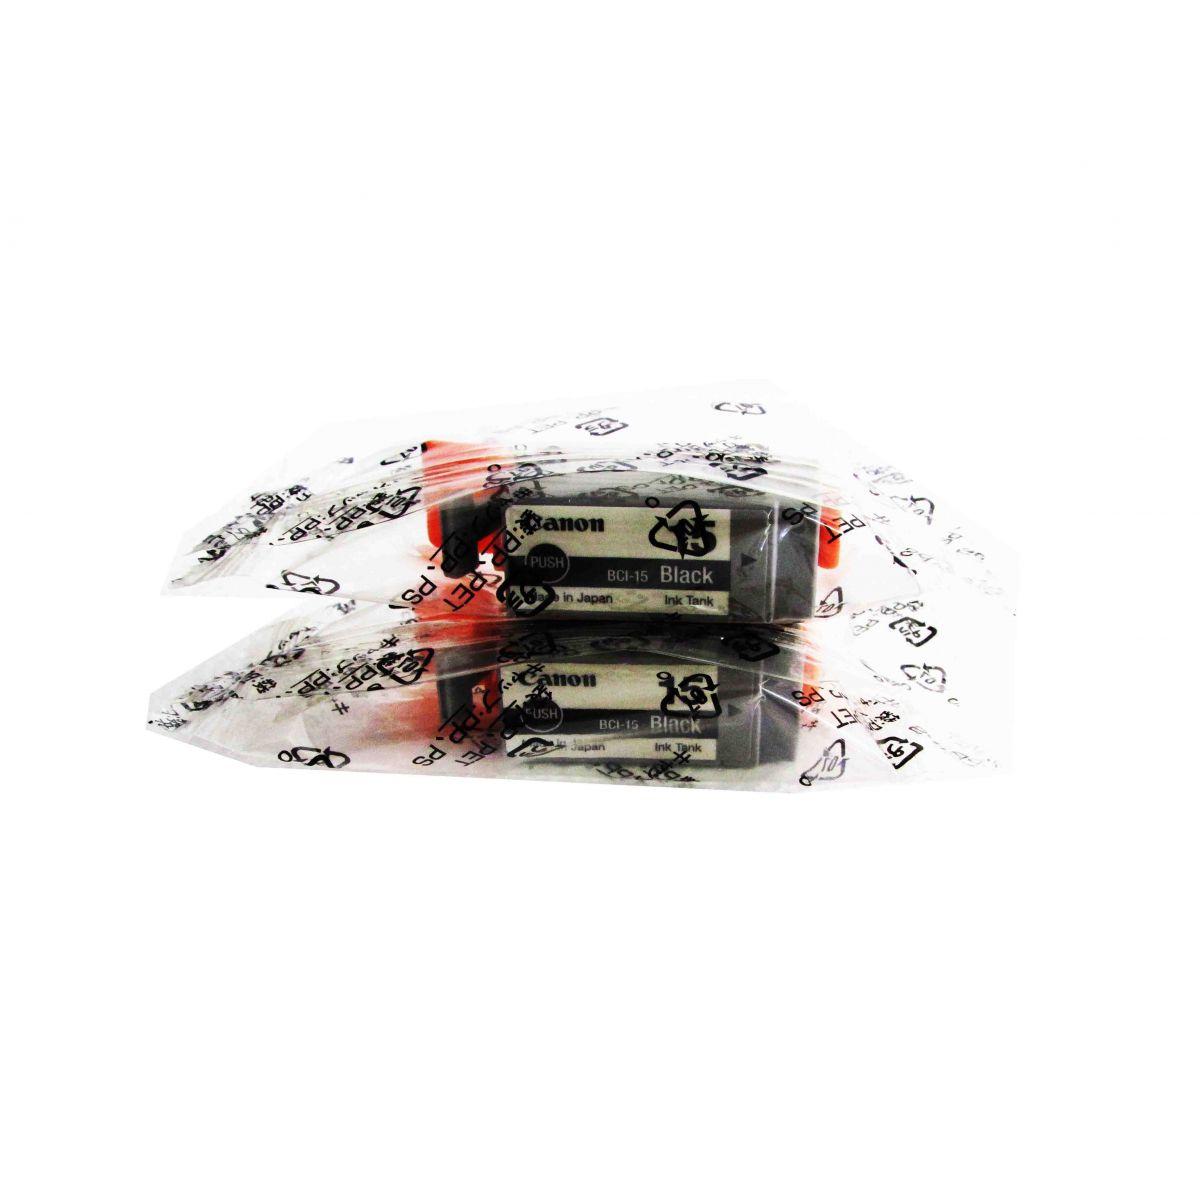 (FORA DE LINHA) Cartucho de tinta Canon Elgin BCI-15 bk ( Blister c/2 unidades ) i70 i80 iP90 iP90v